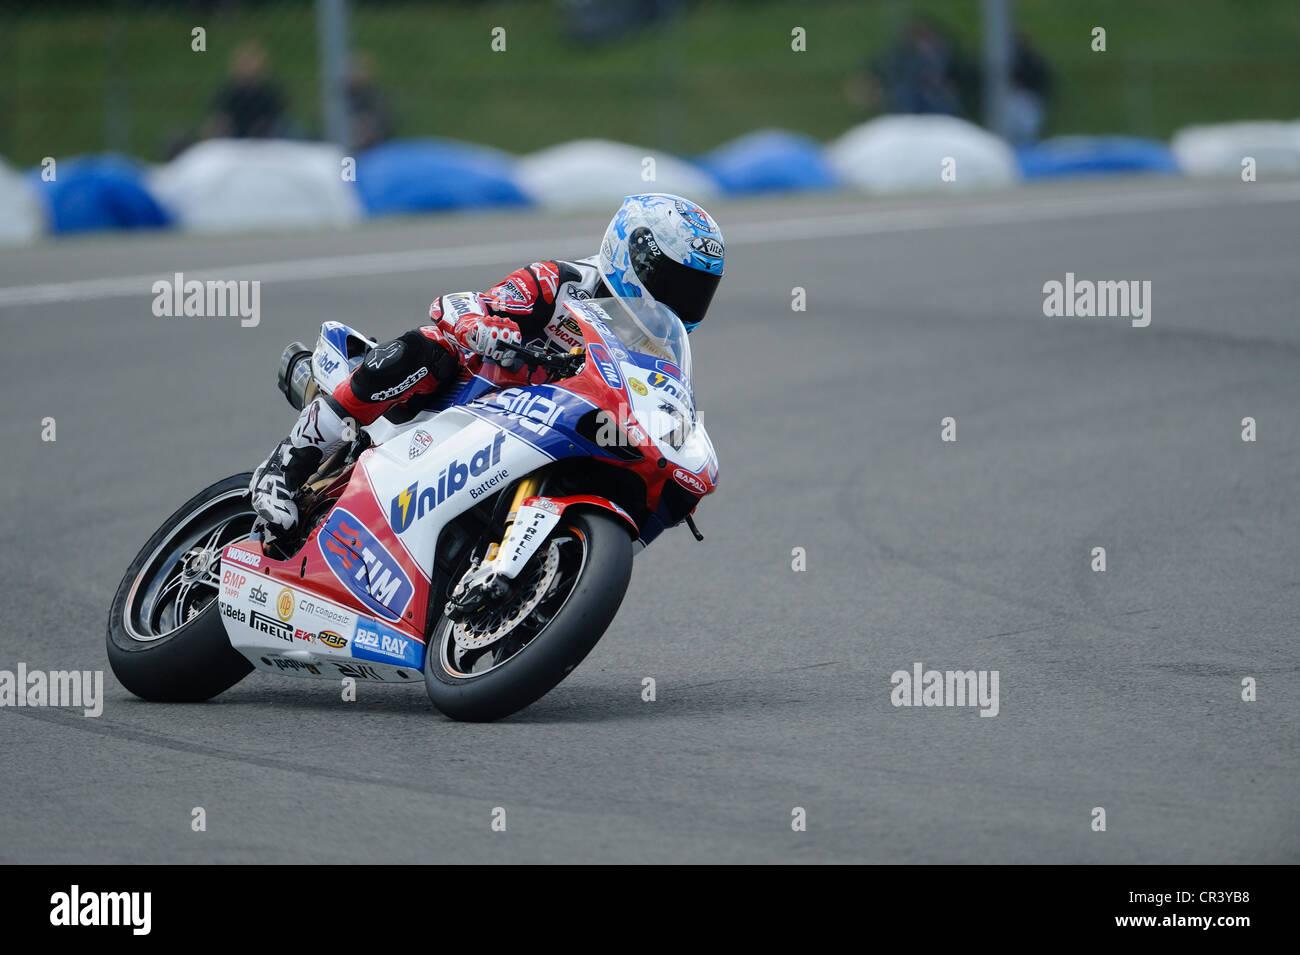 carlos checa on the ducati, WSBK 2012 Stock Photo